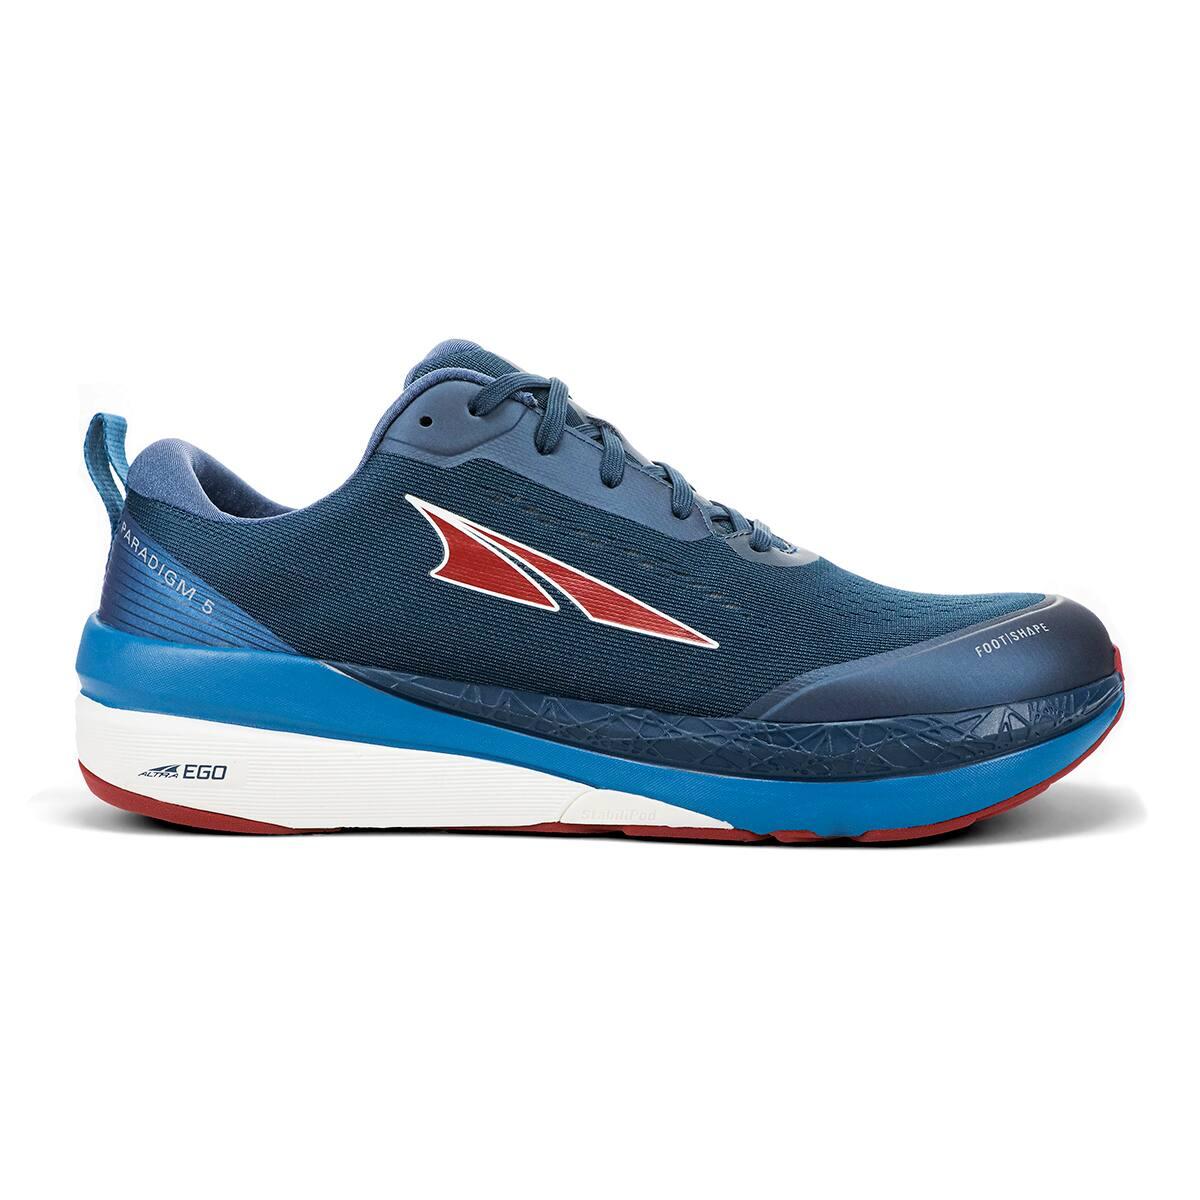 Altra Paradigm 5 Running Shoe (Select Colors) $74.97 + Free S/H at JackRabbit